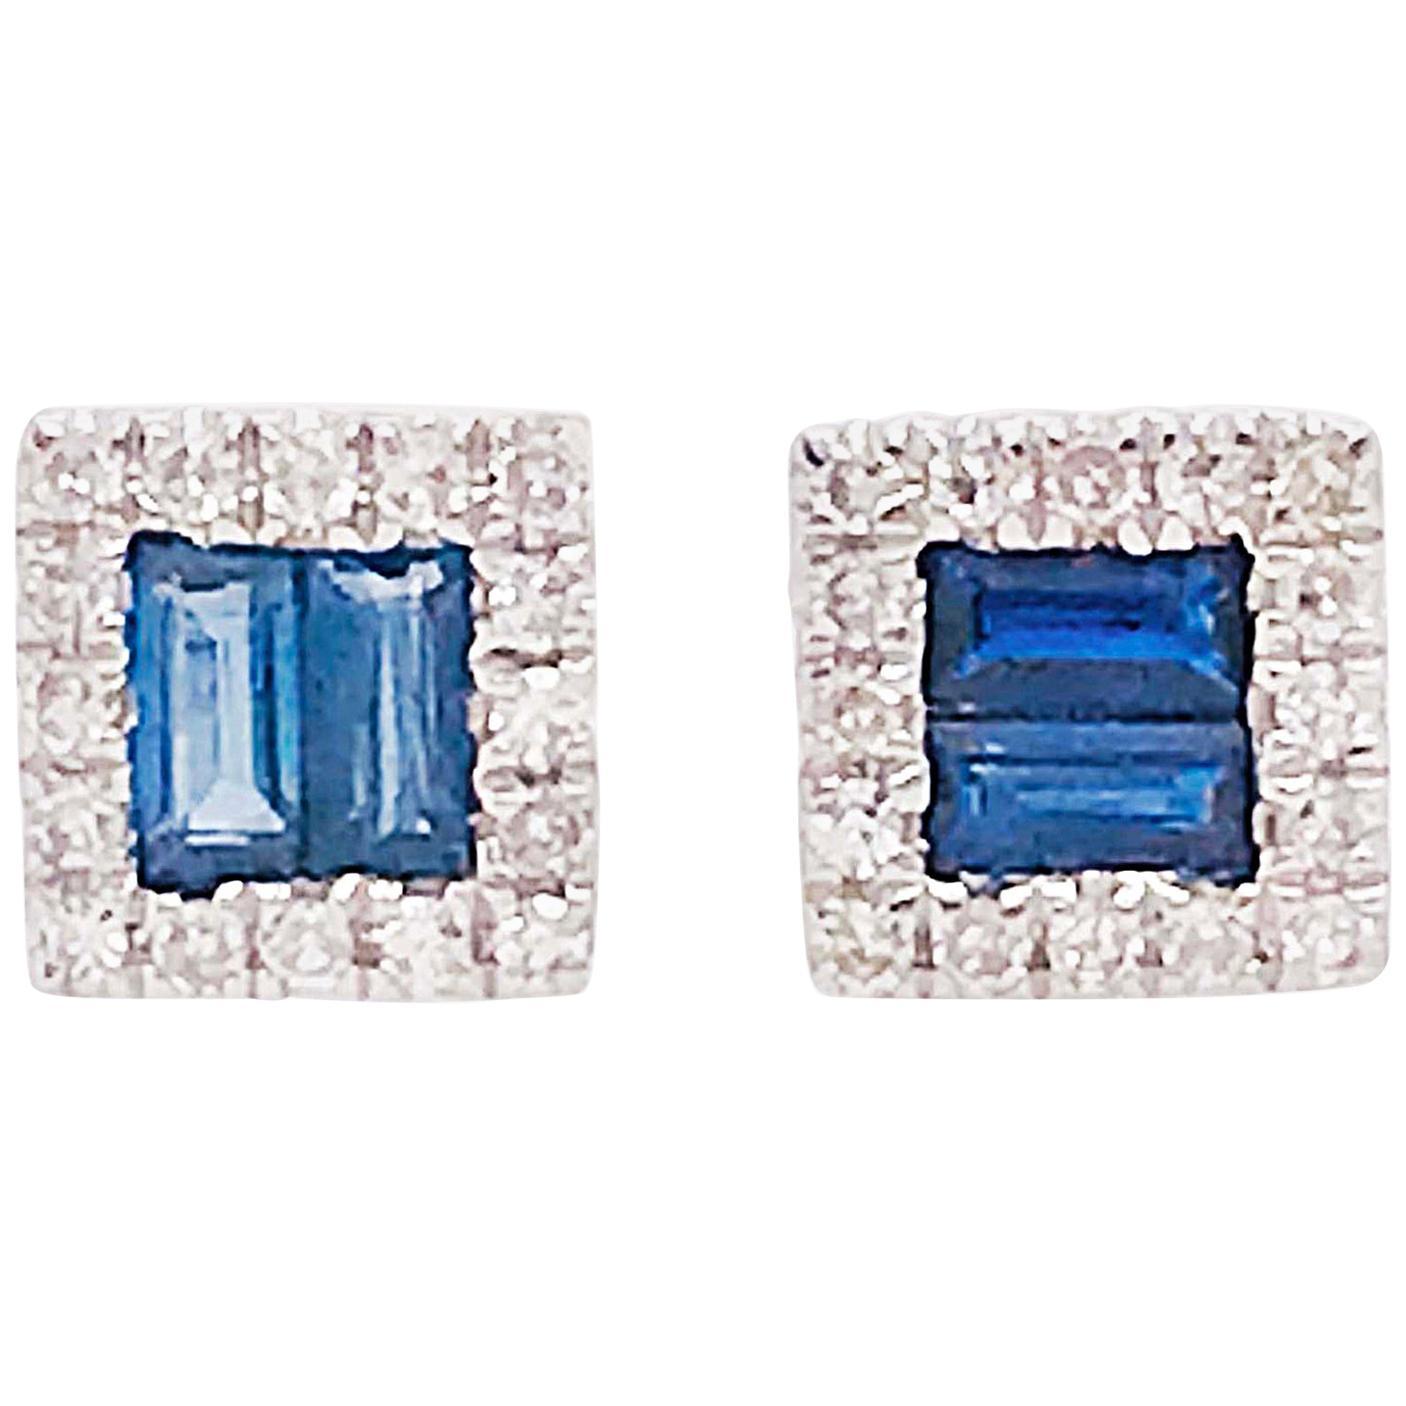 Blue Sapphire and Diamond Earrings, Square Sapphire Studs with Diamond Halo